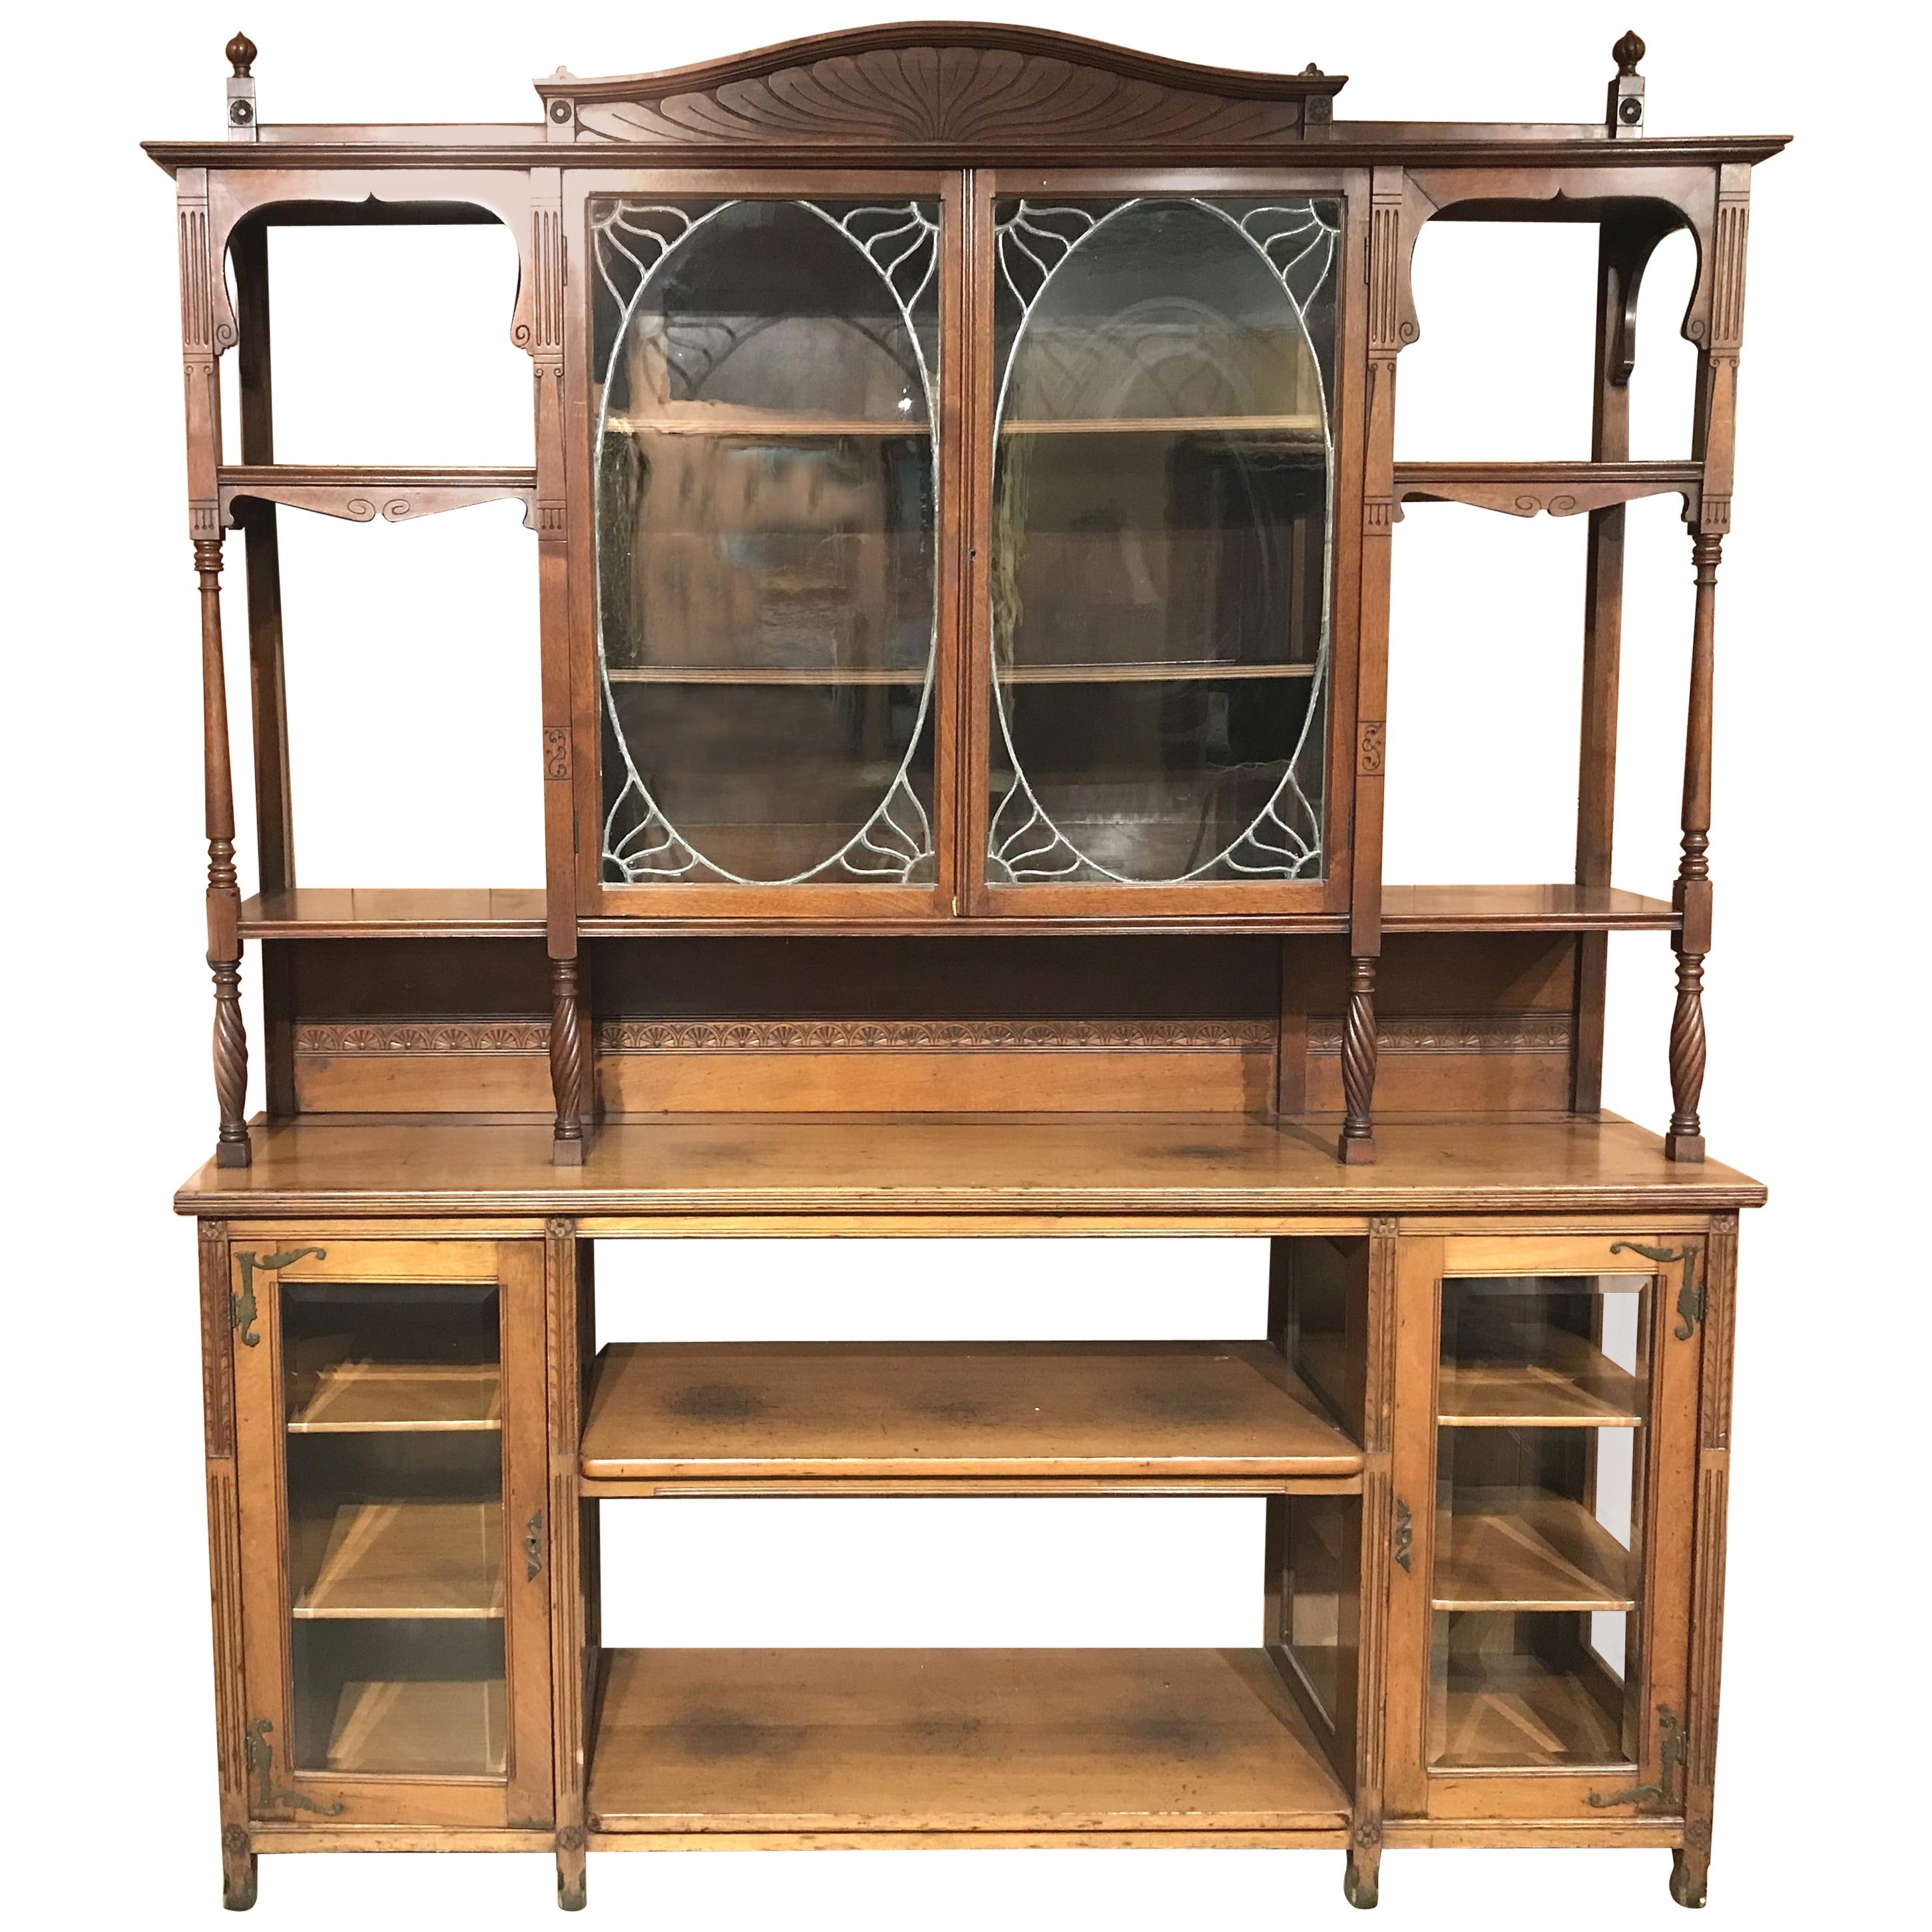 English Art Nouveau Walnut Étagère or Bookcase with Leaded Glass Doors